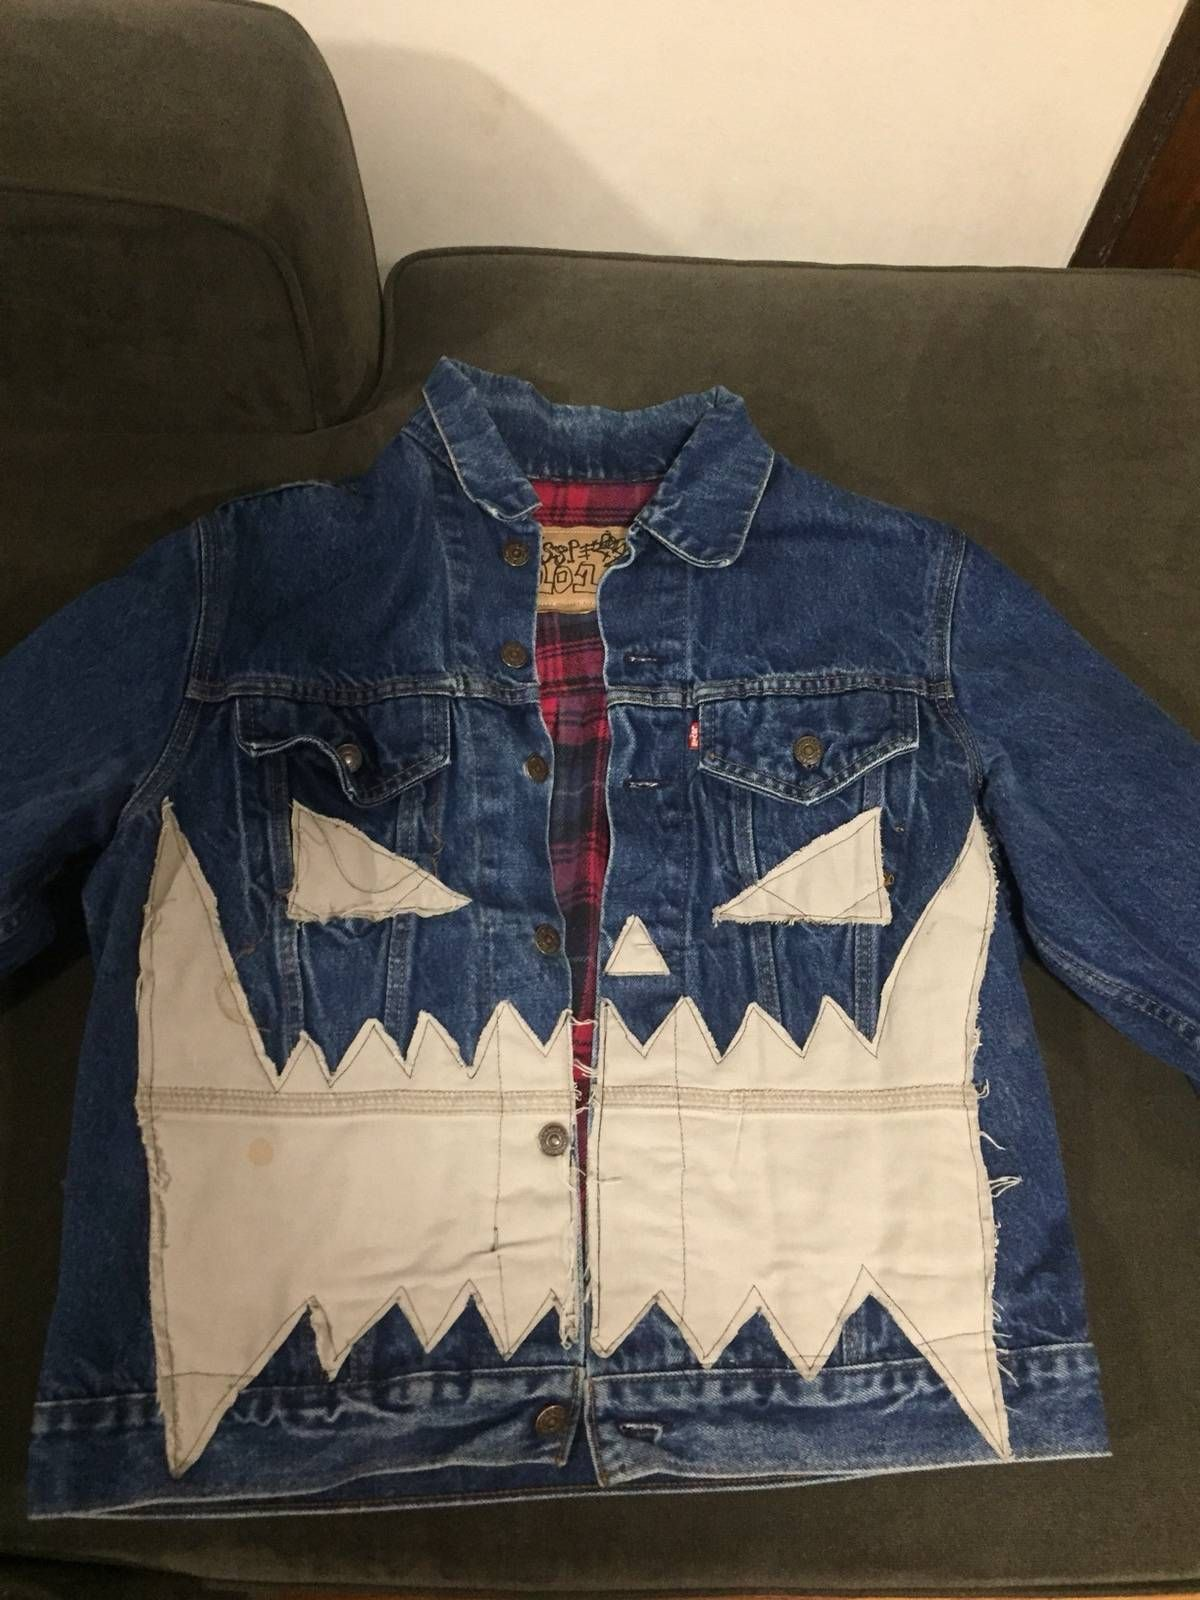 ce0fc017a02 Asspizza Asspizza Flannel Lined Denim Jacket Size l - Denim Jackets for Sale  - Grailed